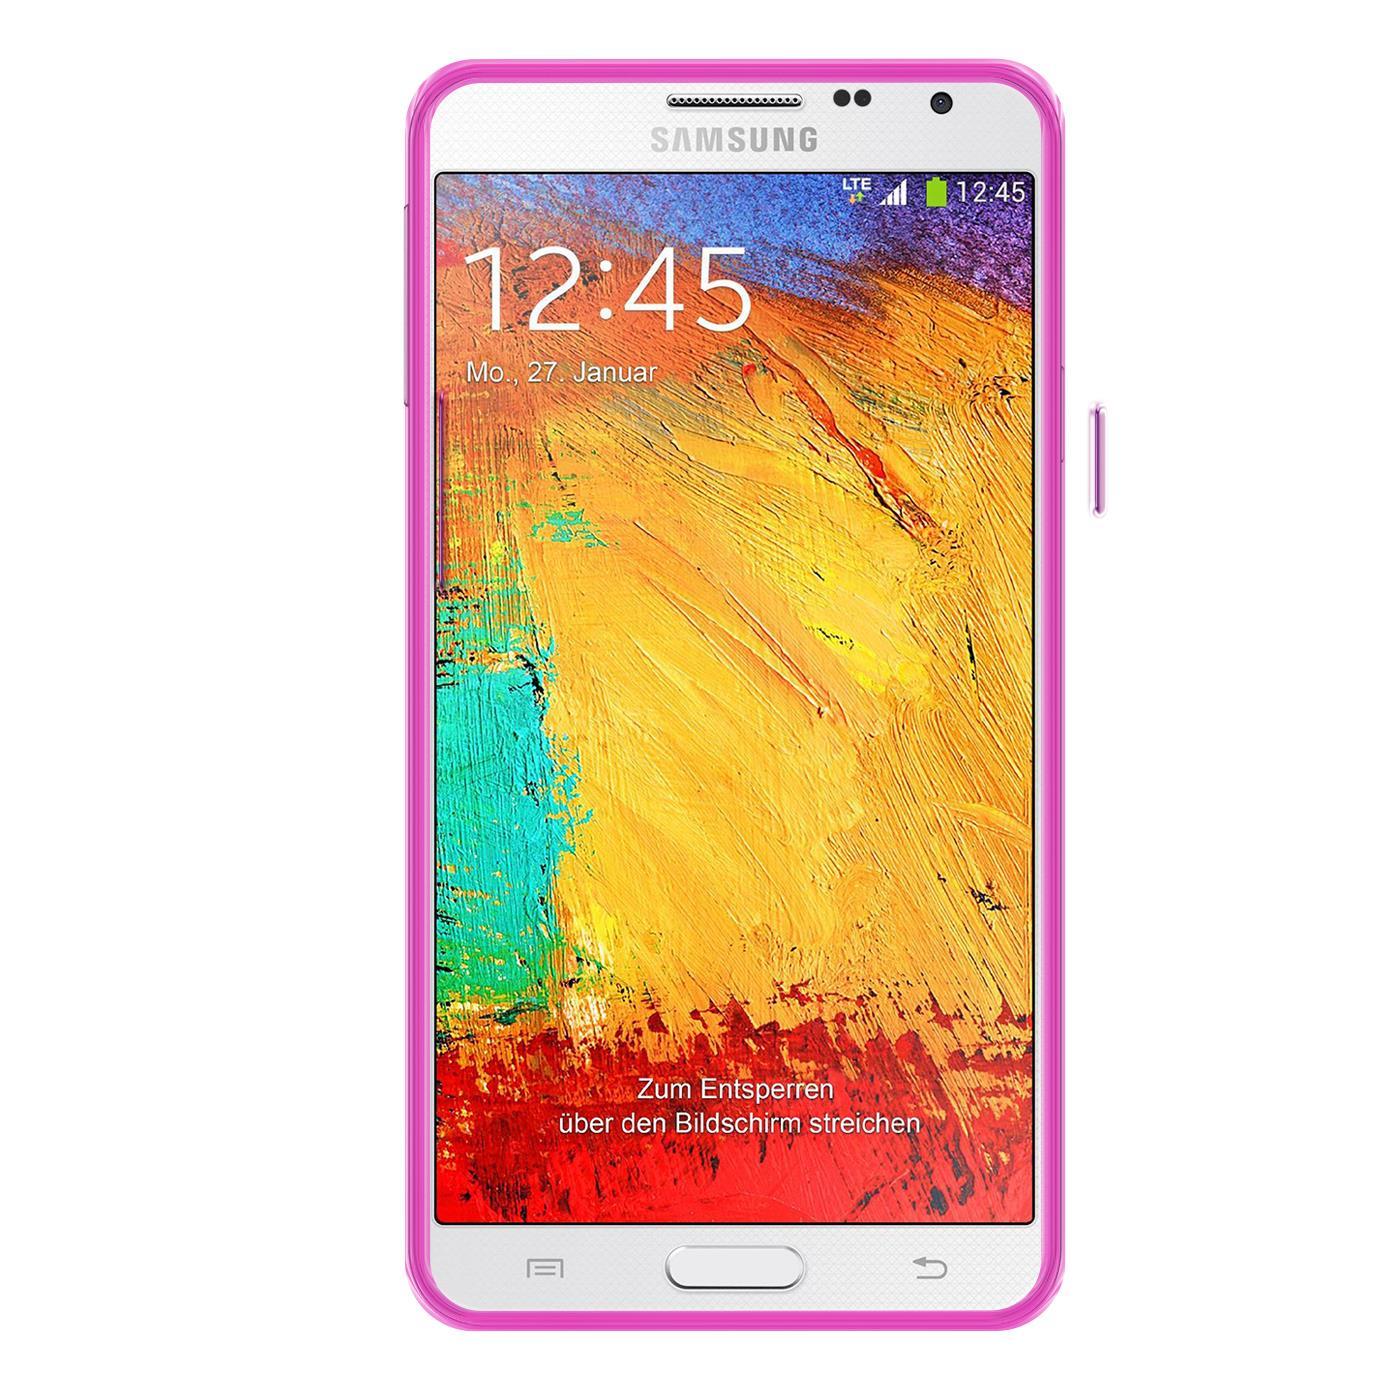 Samsung-Galaxy-Note-4-Thin-Silikon-Klar-Case-Cover-Ultra-Slim-Stossfeste-Gel Indexbild 25